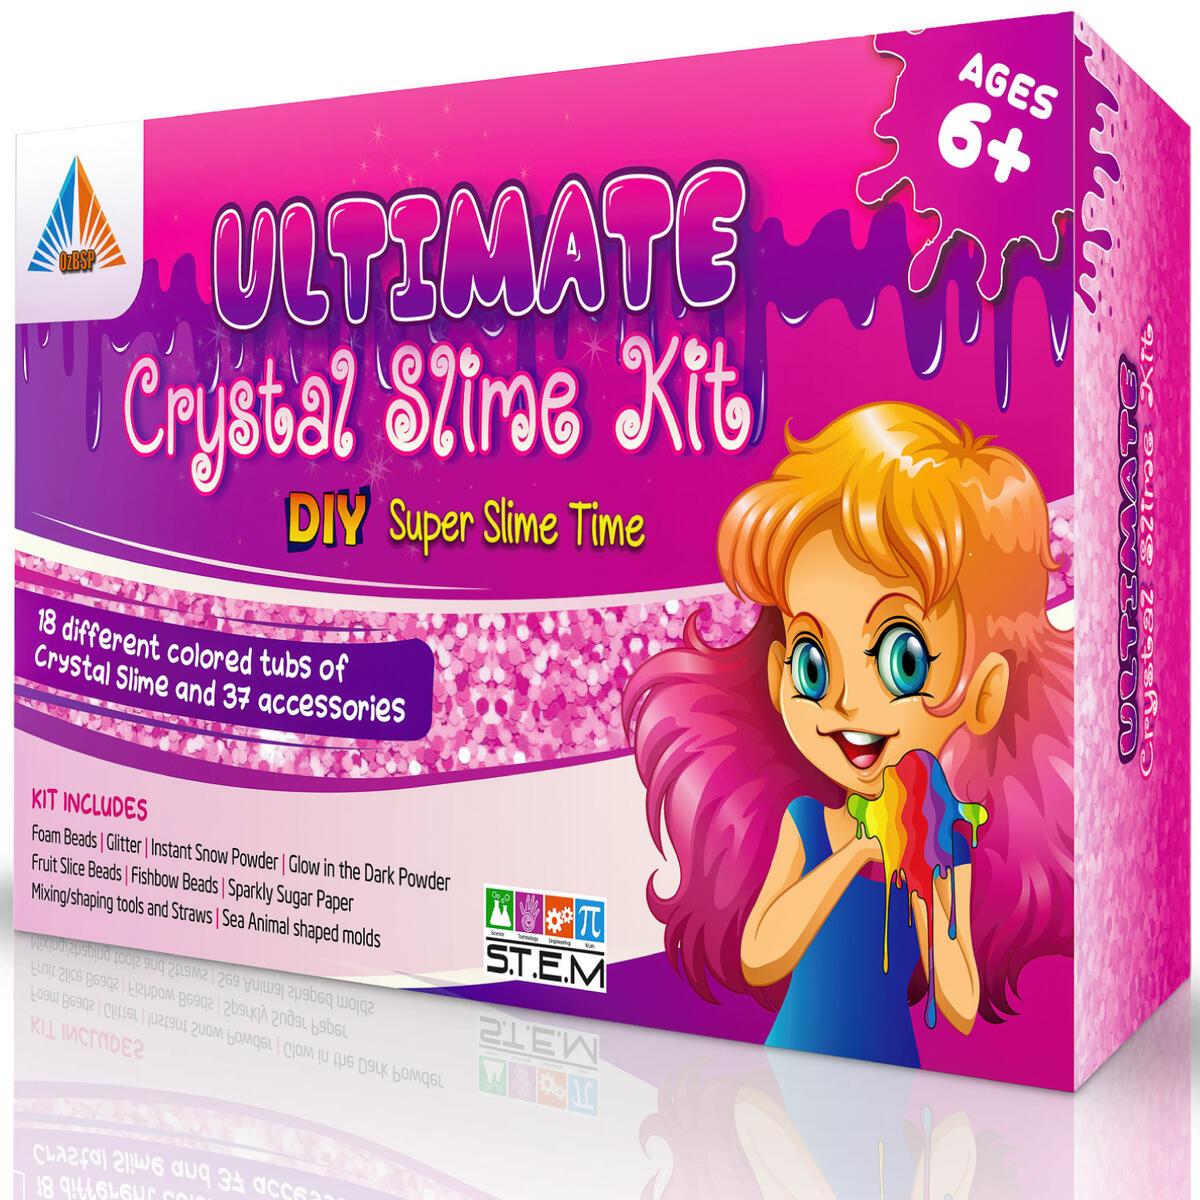 OzBSP Crystal Slime Kit. Slime Supplies. DIY Slime Making Kit for Girls Boys Kids. 18 Tubs Pre-made Crystal Slime, 37 Mix in Accessories